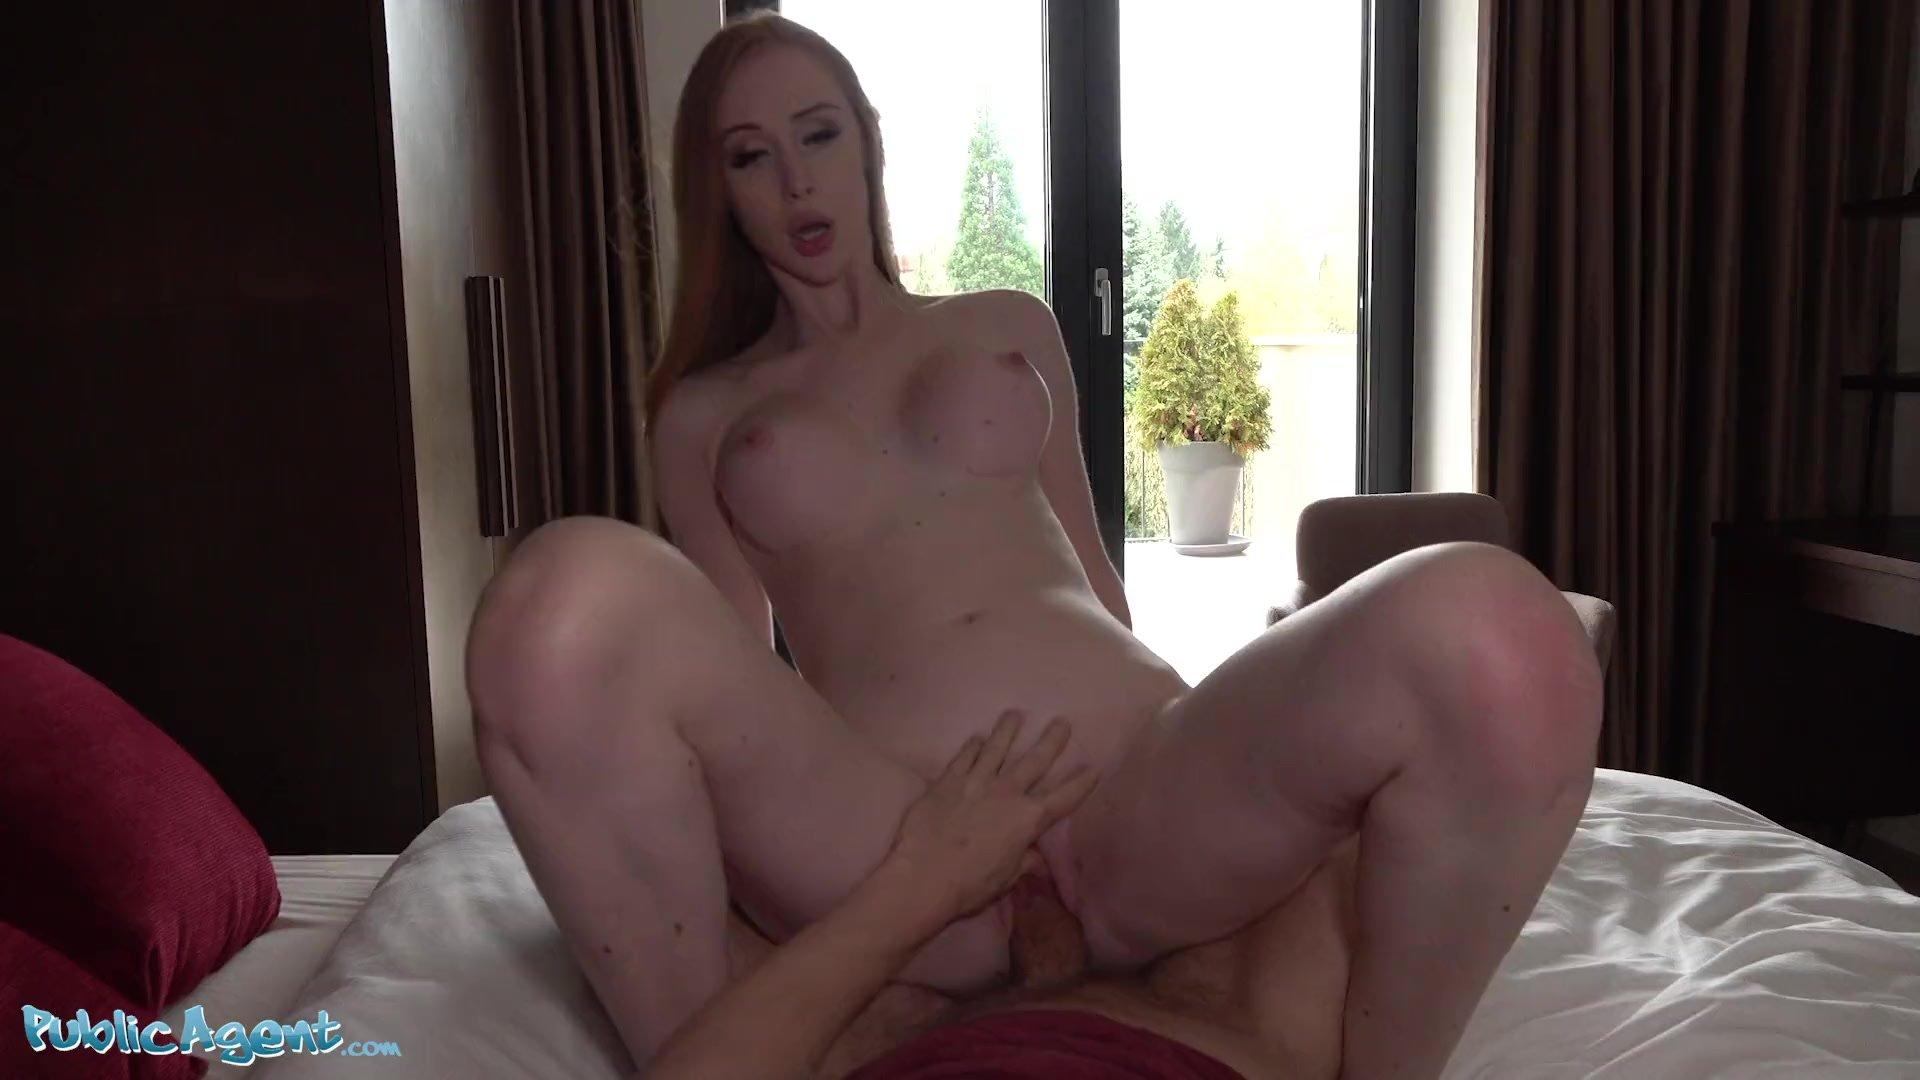 Actriz Porno Damaris Xxx public agent redhead brit lenina crowne fucks for posh villa